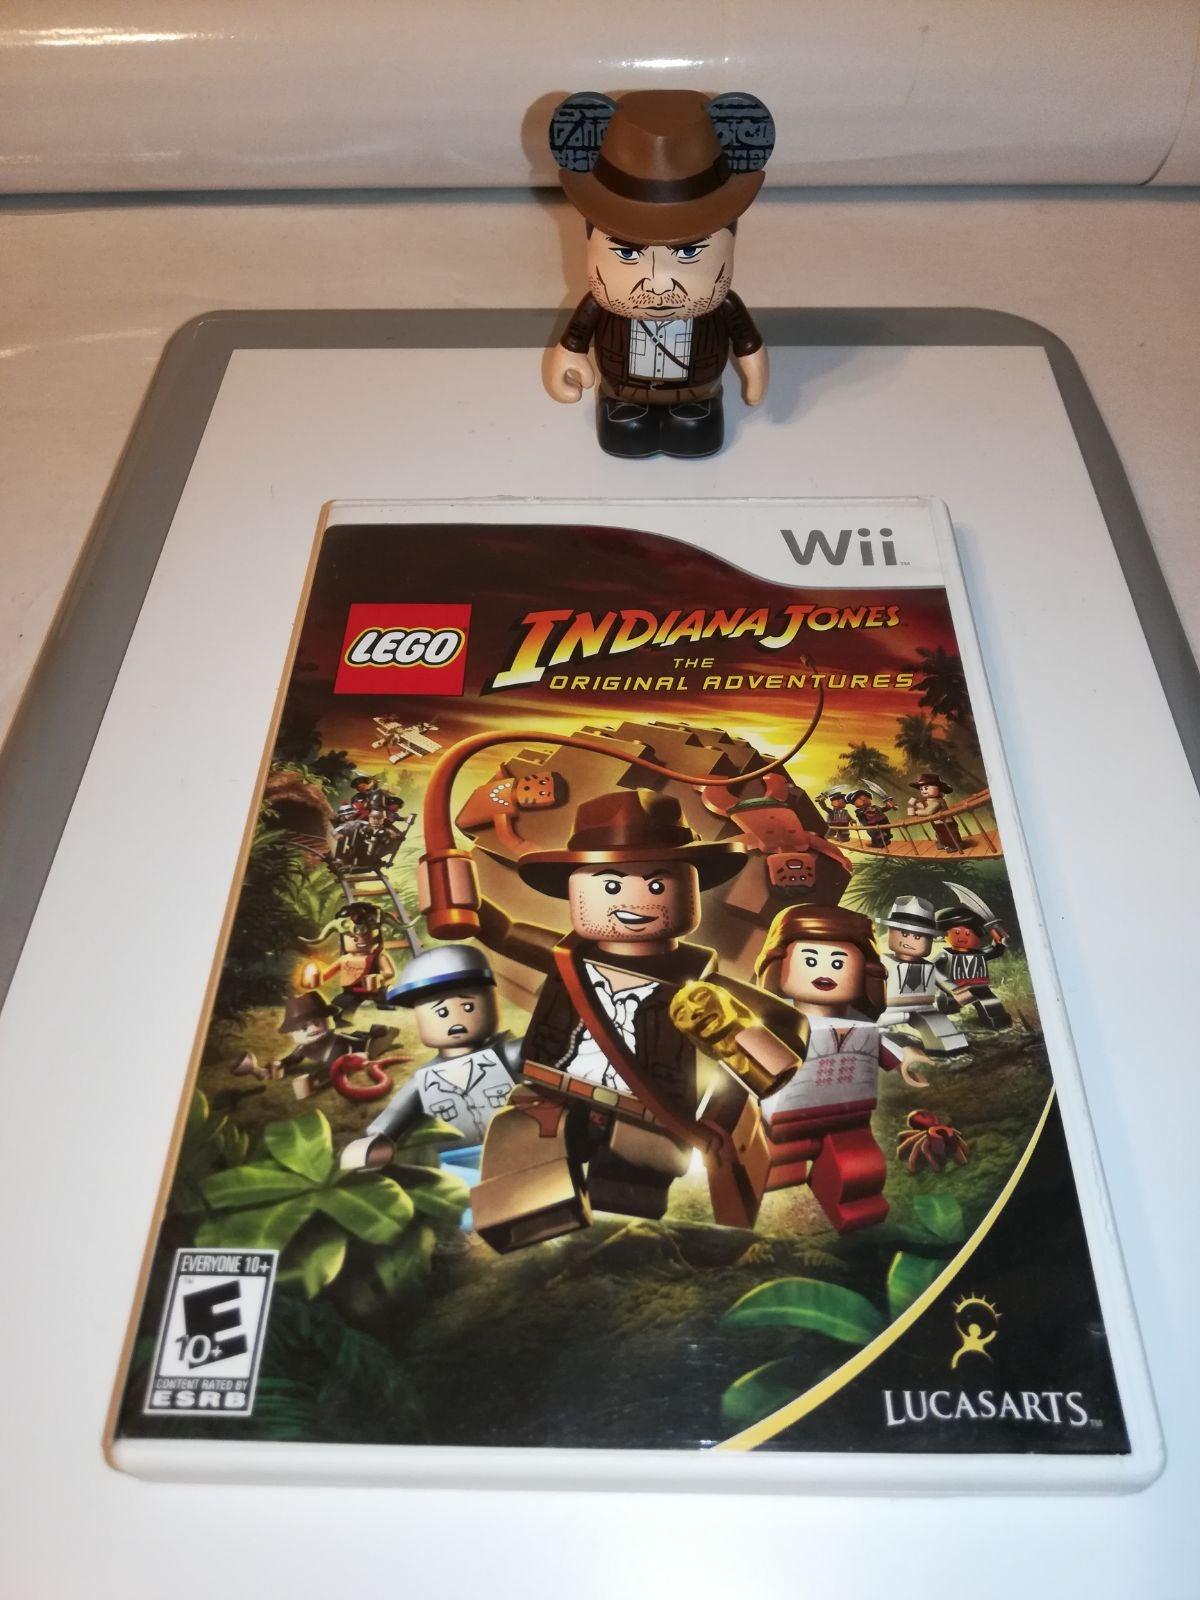 Wii Lego Indiana Jones + vinylmation ind